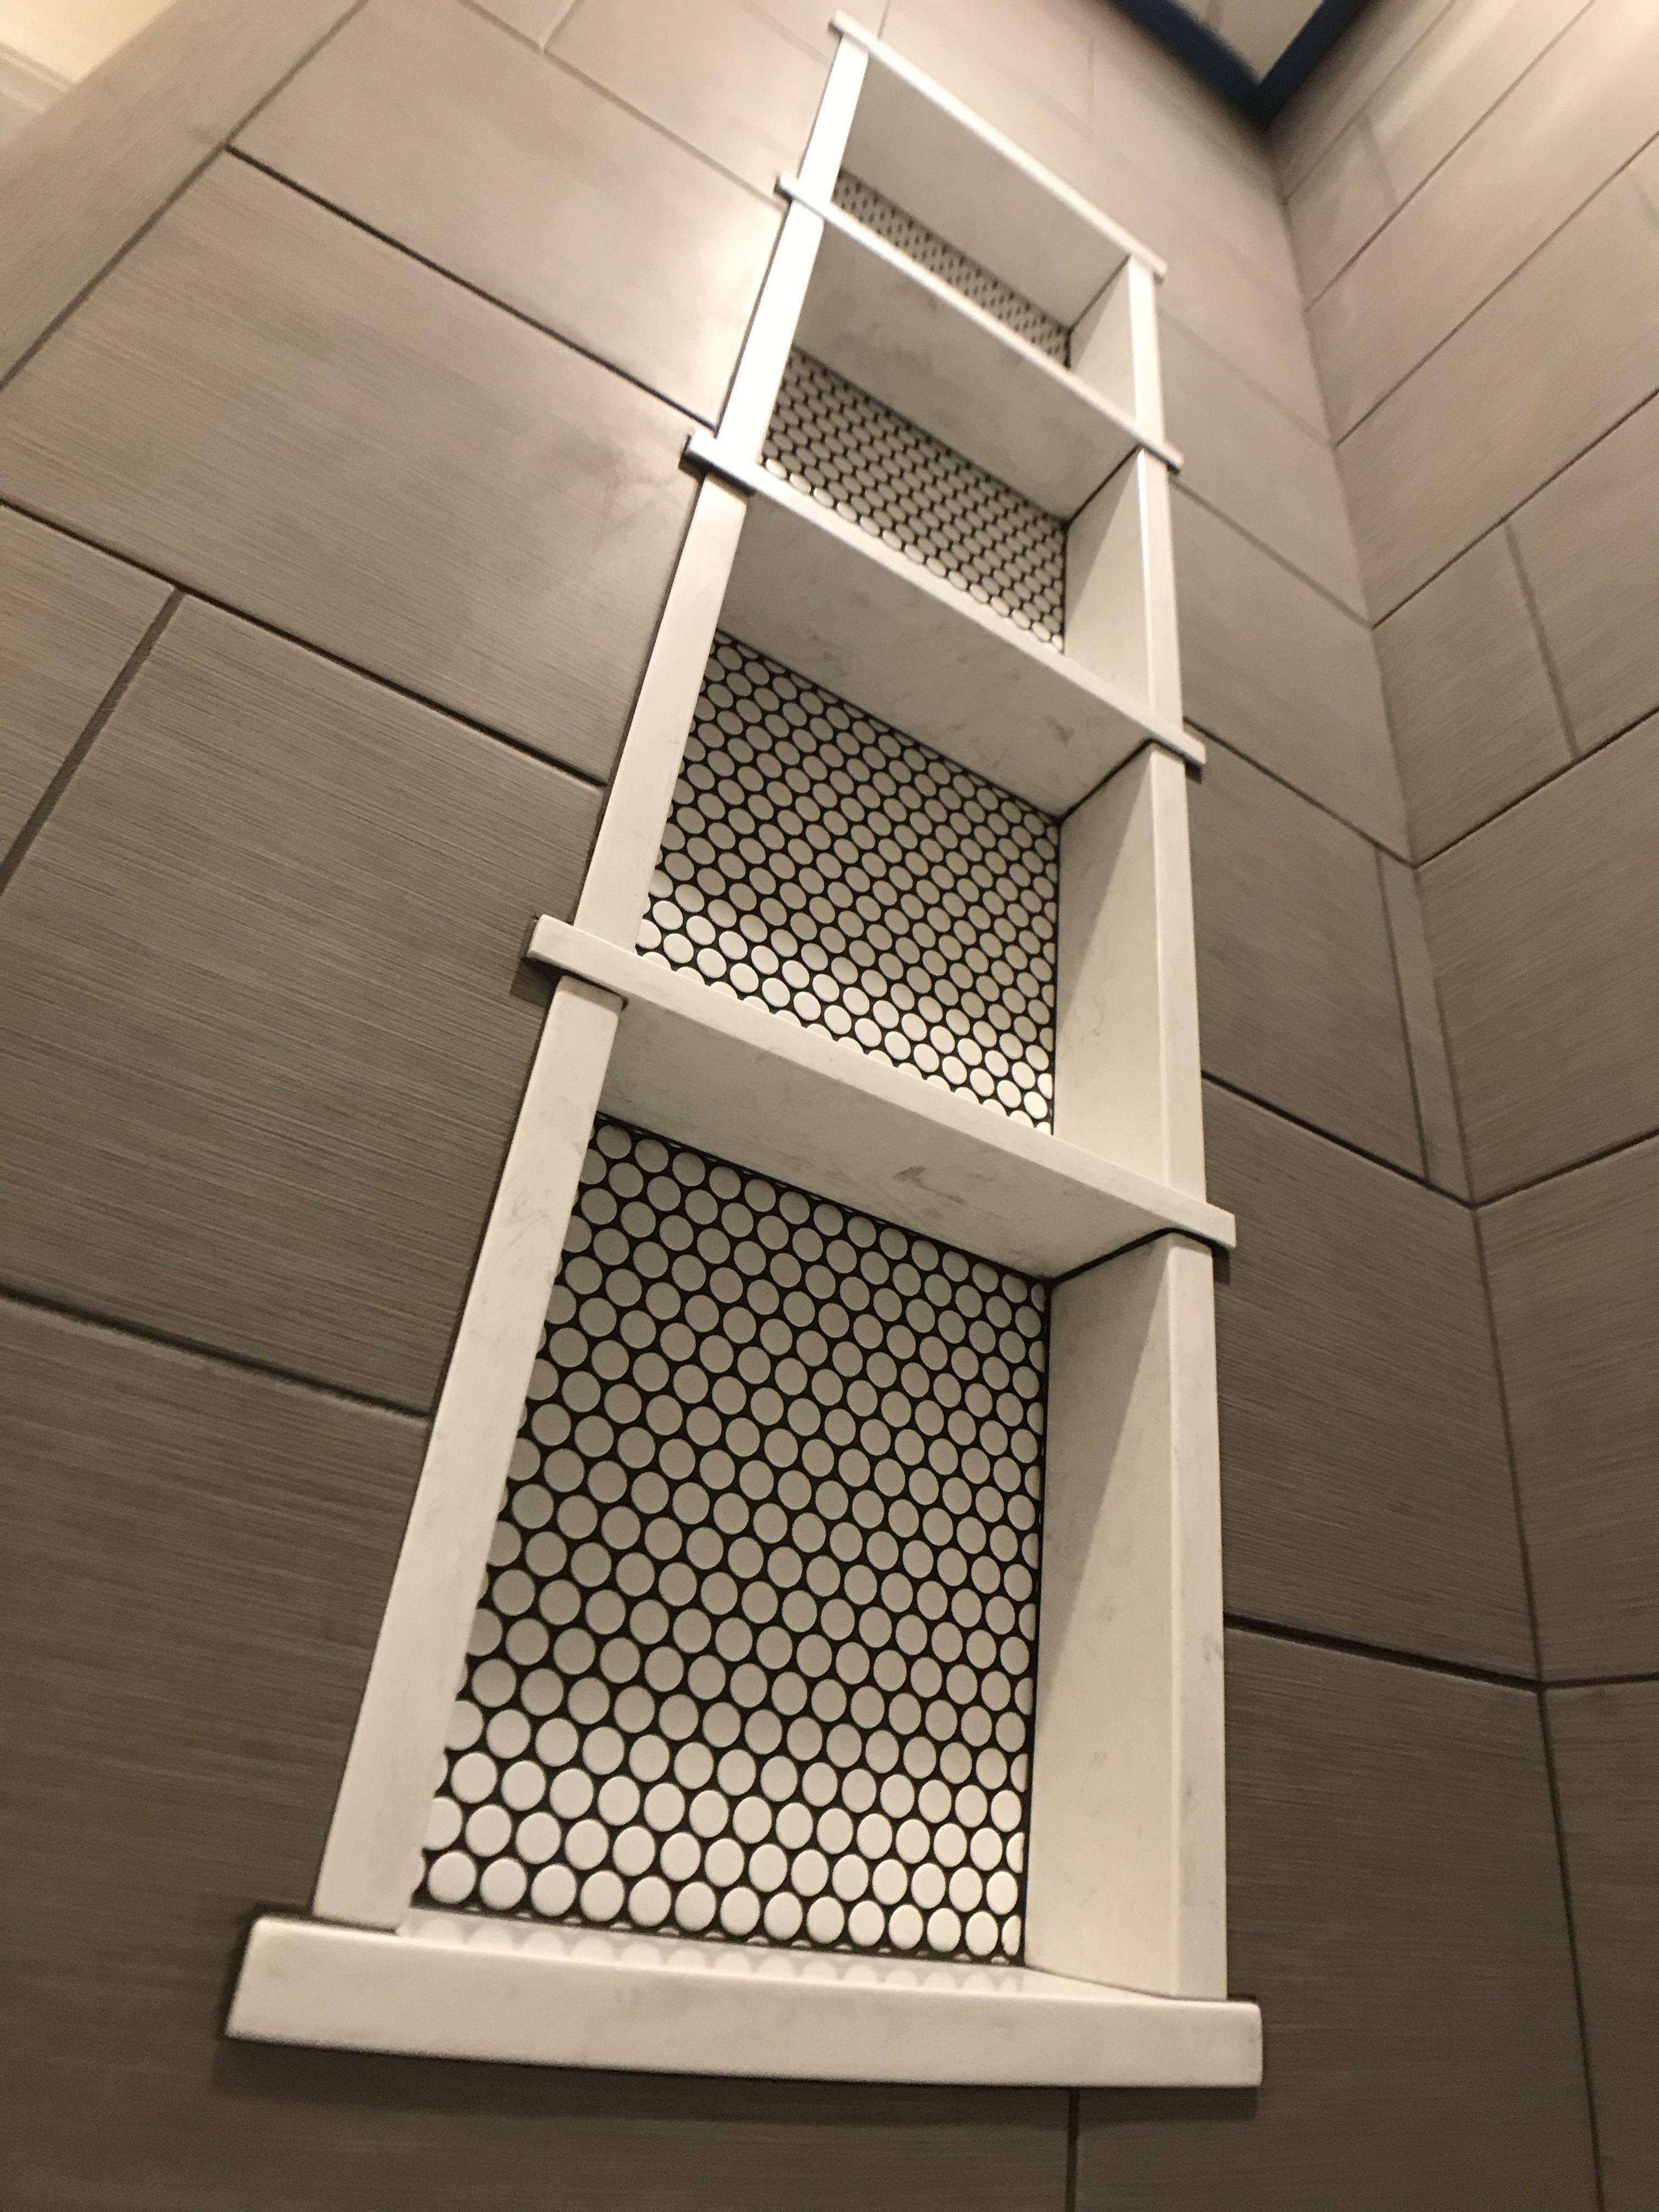 3 Shelves 4 Compartment Penny Round Niche Tile